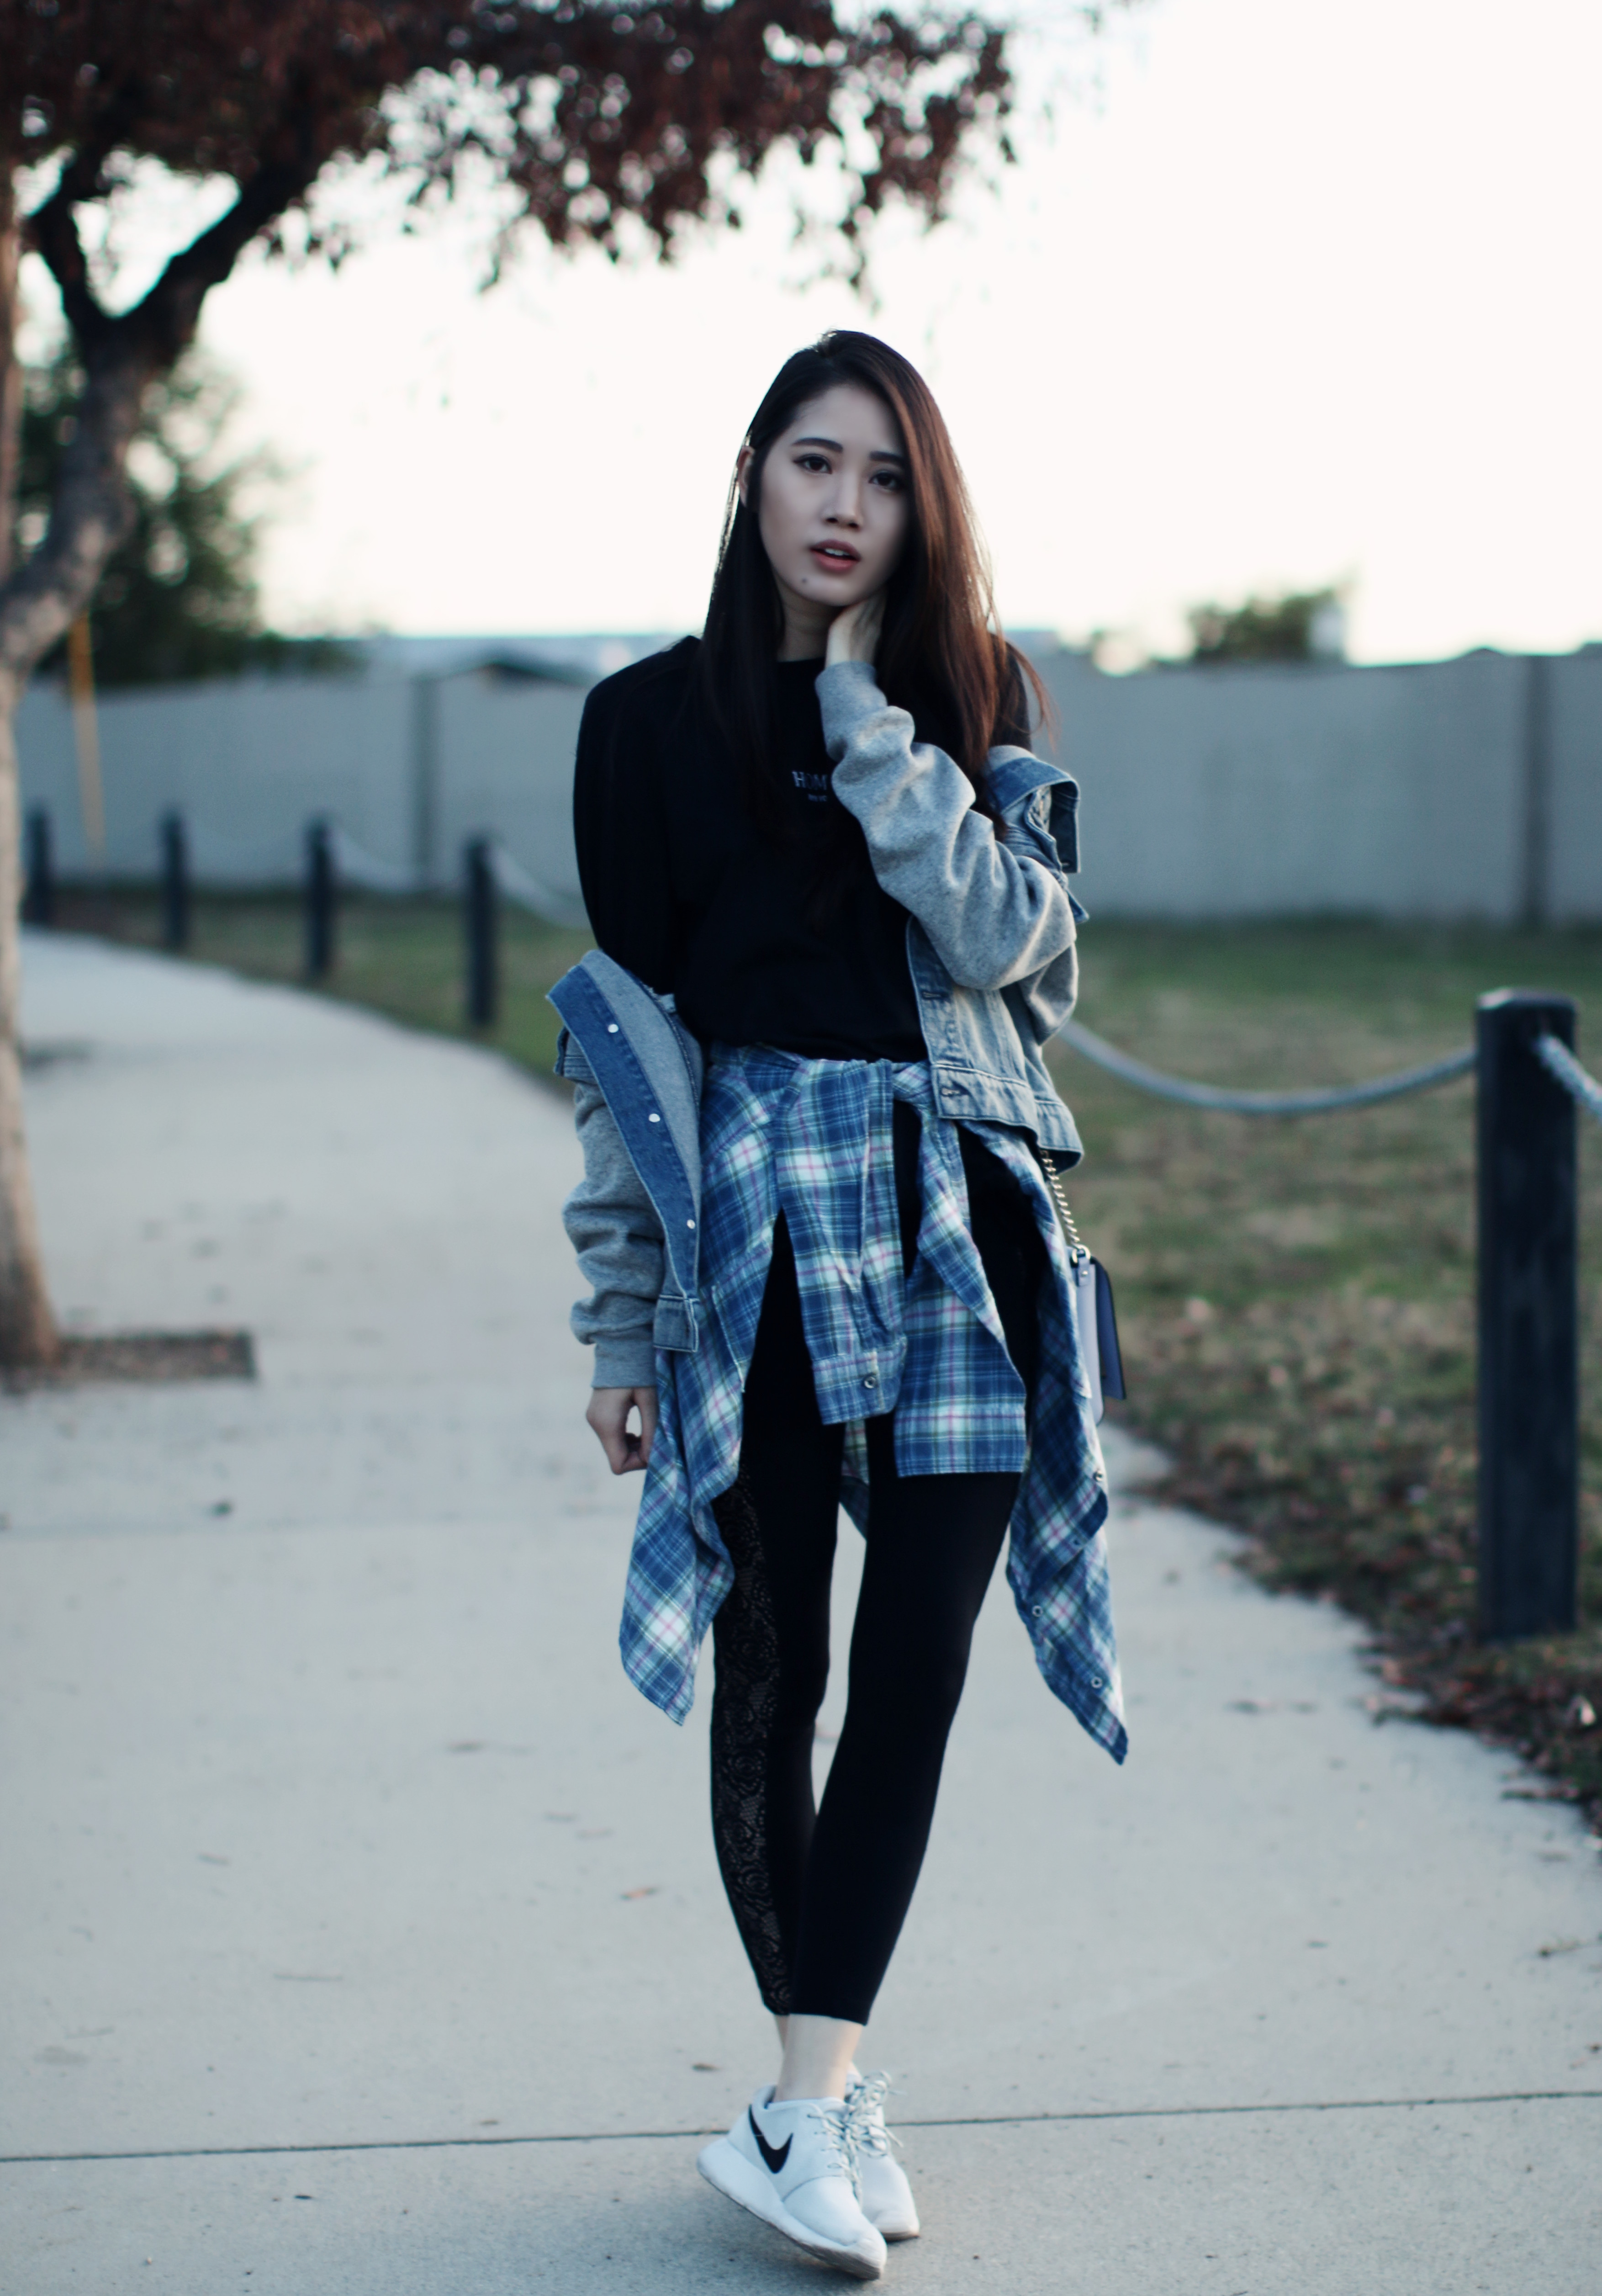 4324-ootd-fashion-style-outfitoftheday-wiwt-streetstyle-urbanoutfitters-hm-f21xme-nike-elizabeeetht-clothestoyouuu